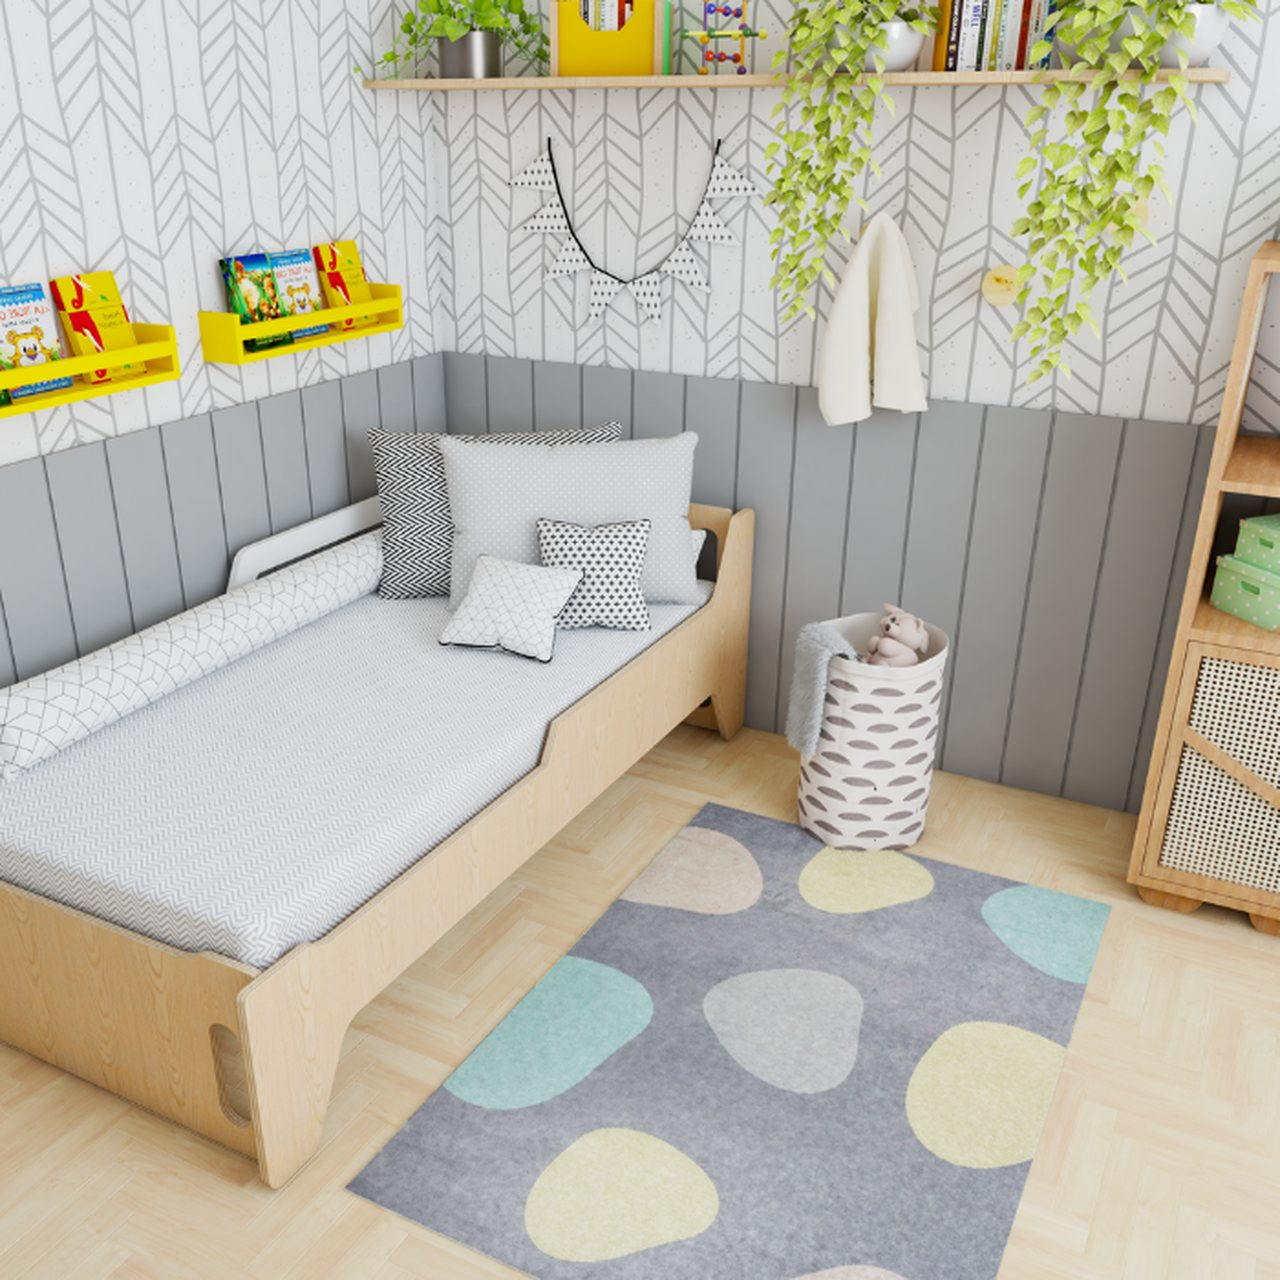 Tapete quarto infantil estampa Bolhas